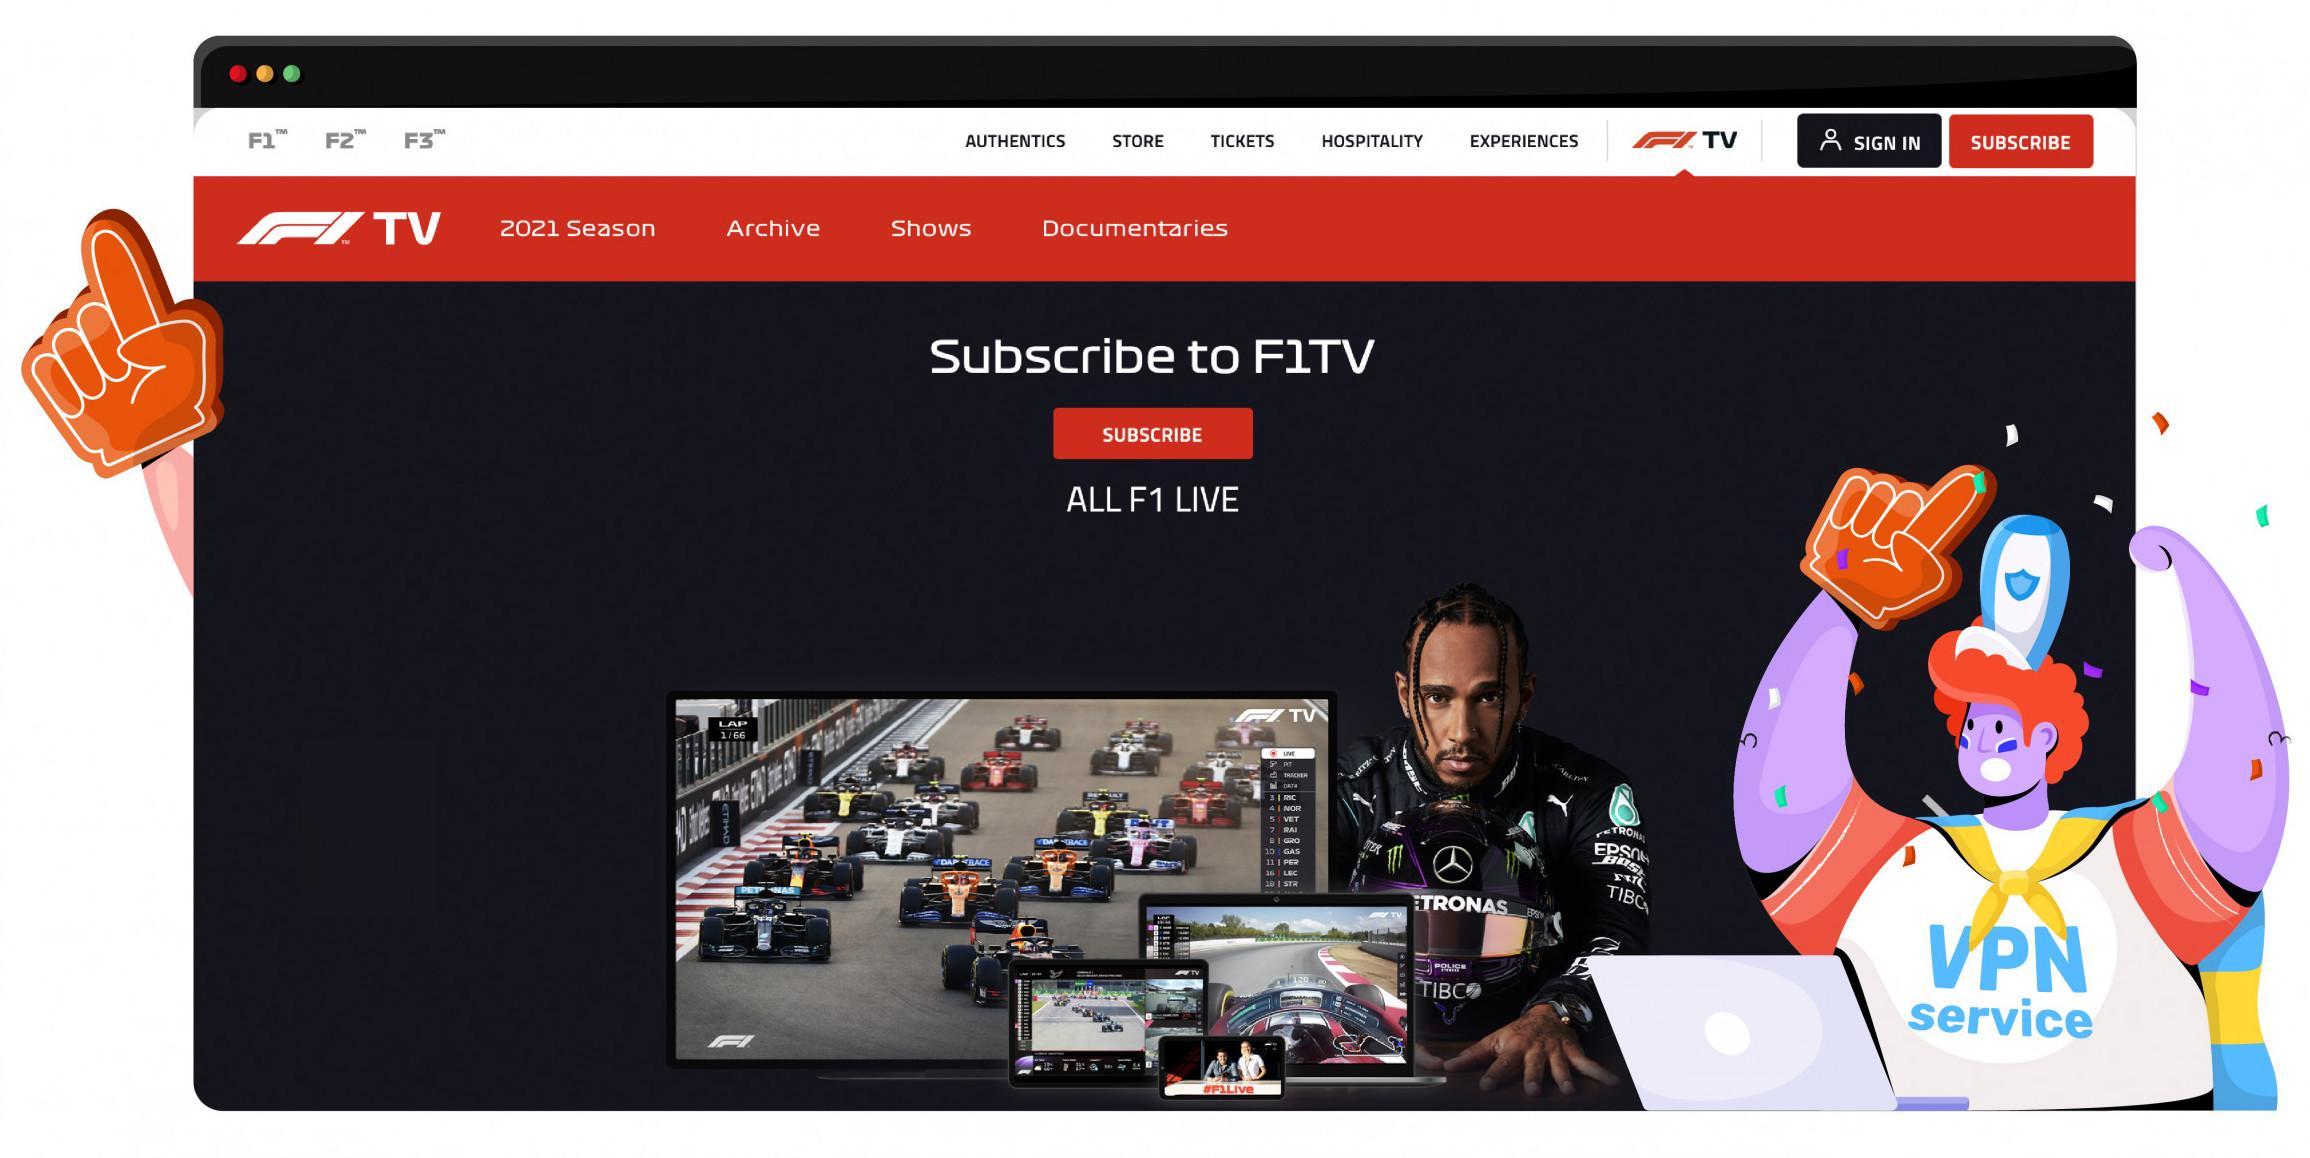 F1 TV is a platform for the Formula 1 races